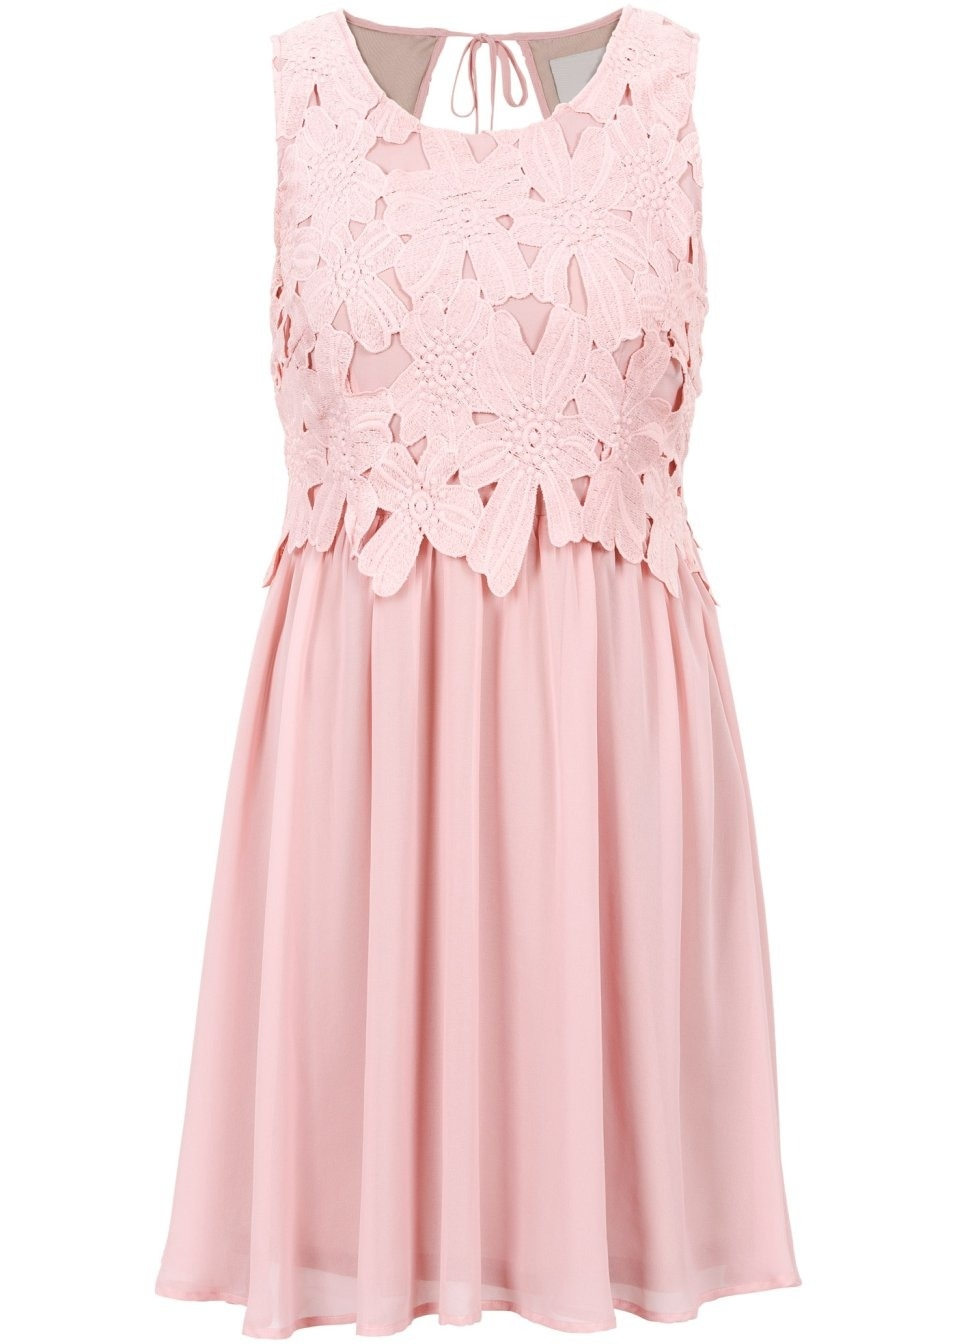 20 Einfach Kleid Altrosa Kurz Vertrieb15 Erstaunlich Kleid Altrosa Kurz Bester Preis